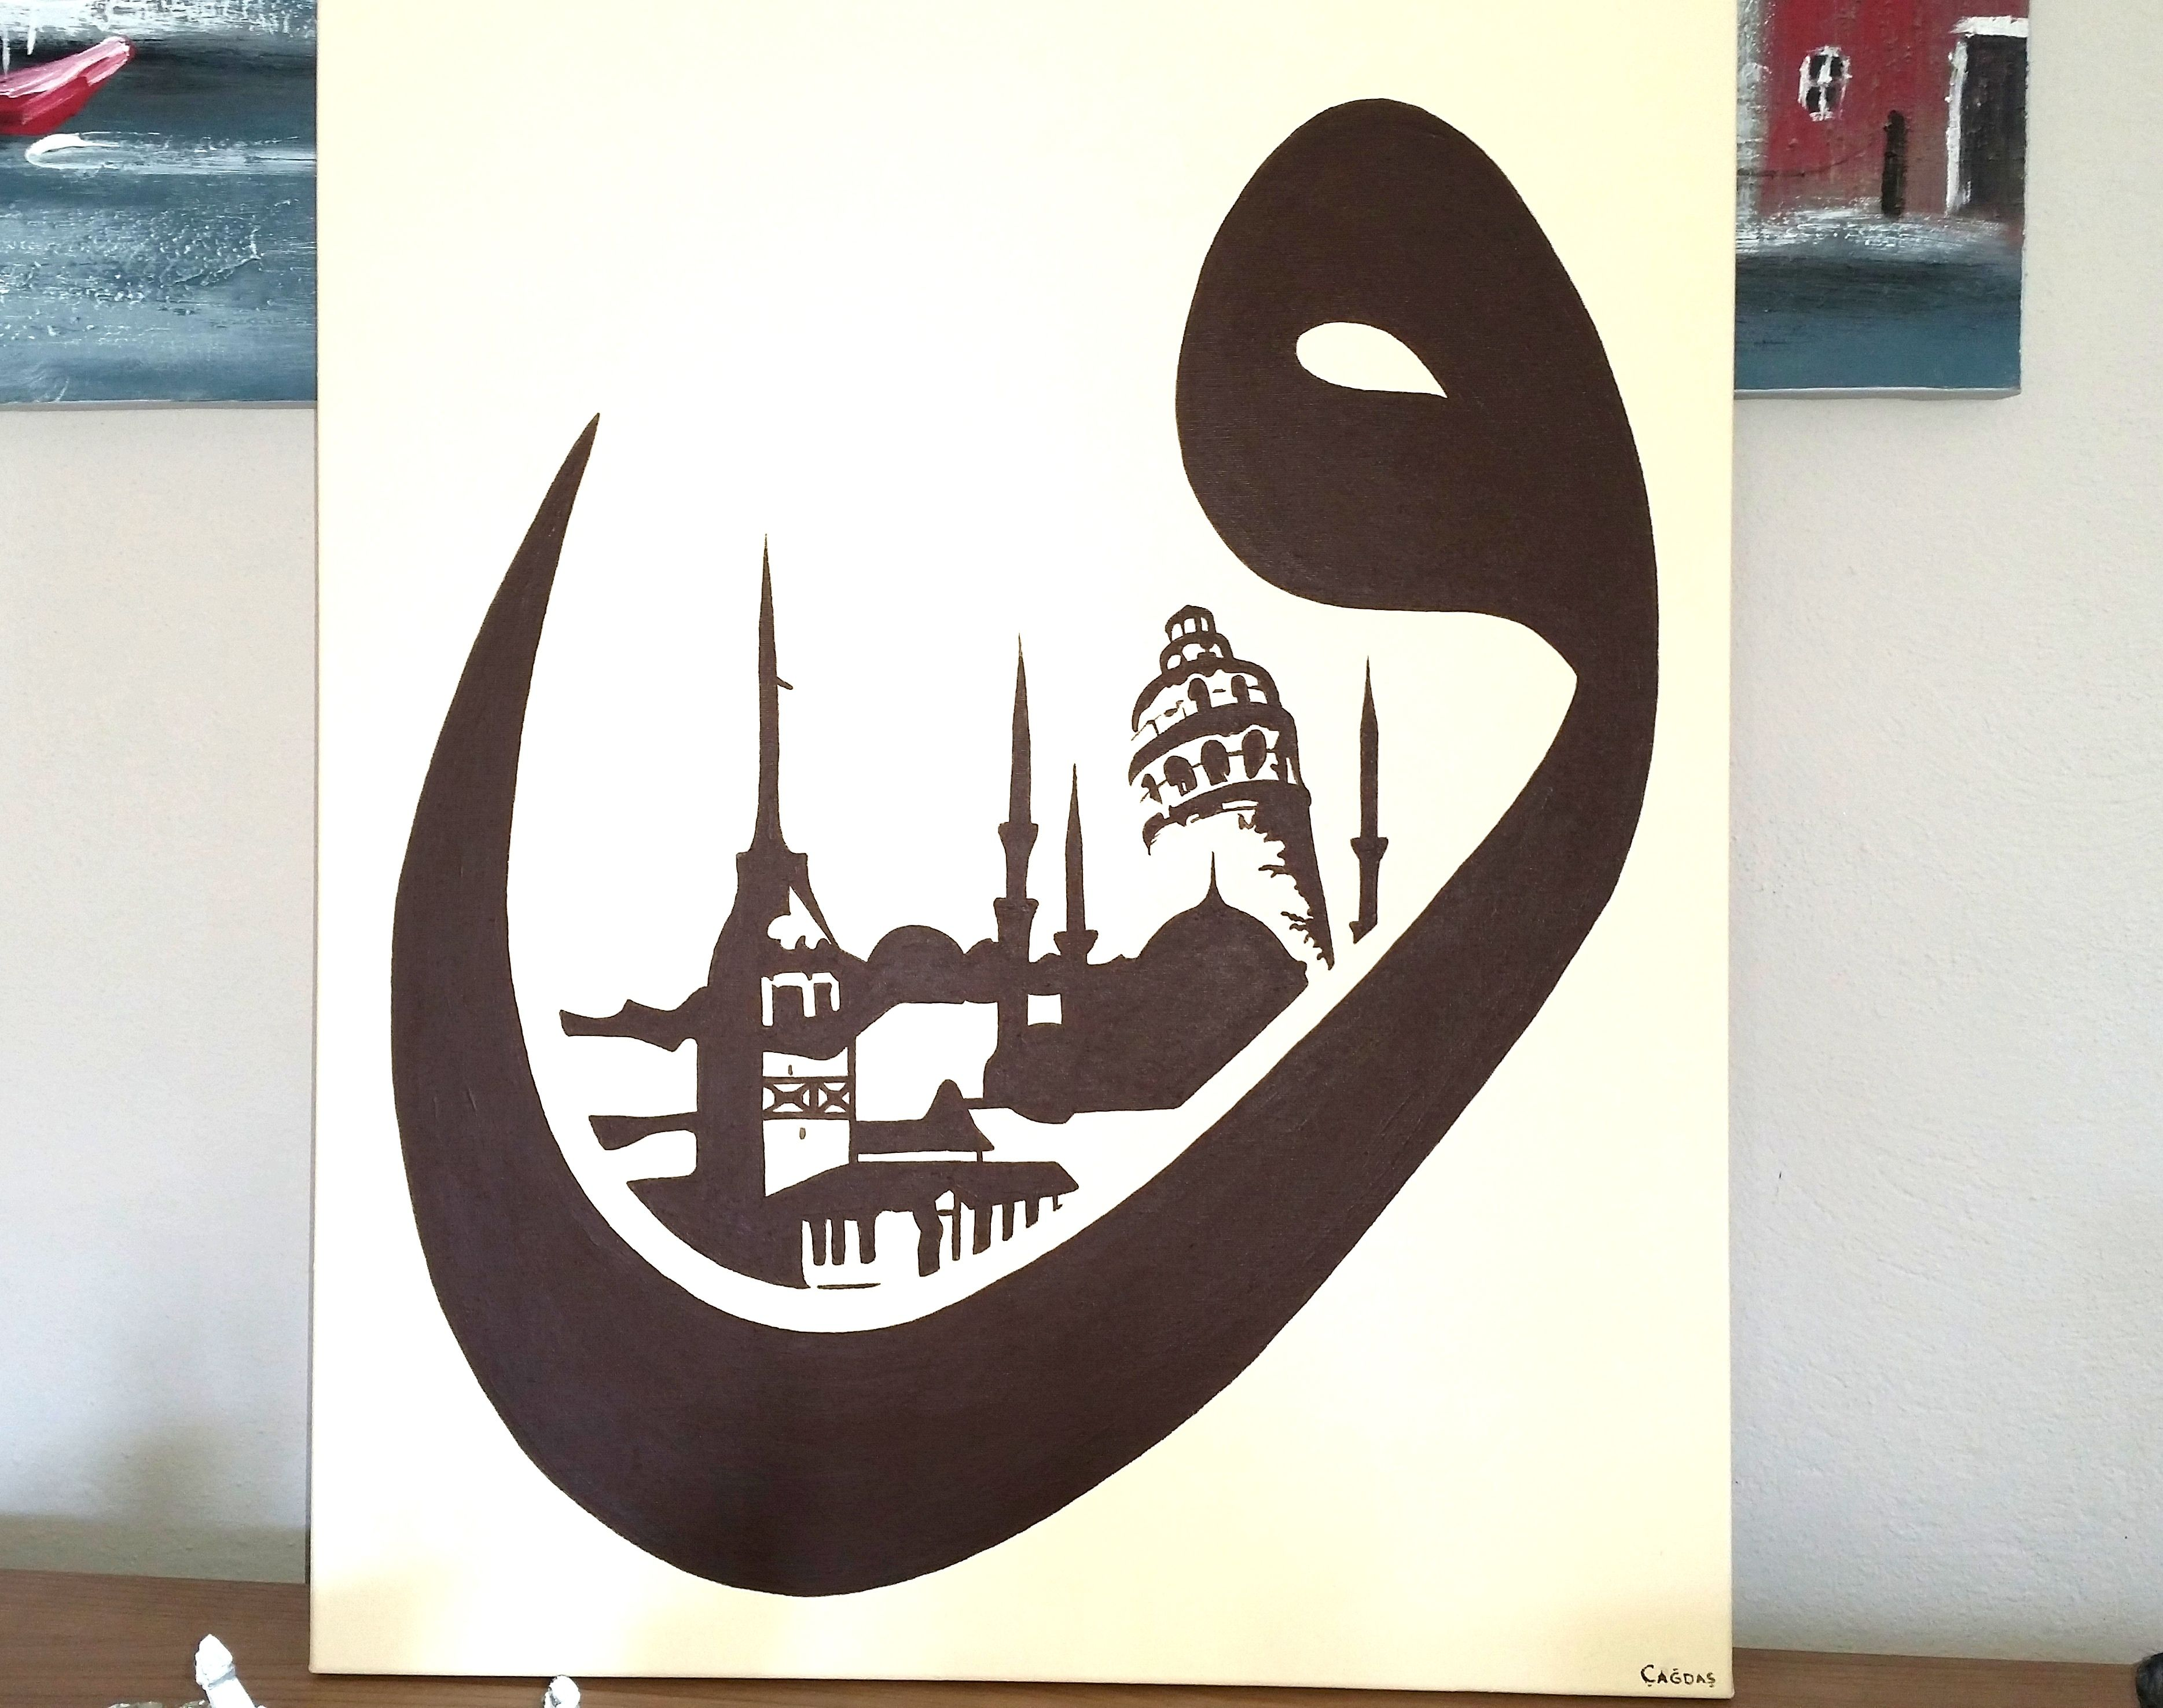 Vav Icinde Istanbul Tuval Uzerine Akrilik Boya Referanslidir